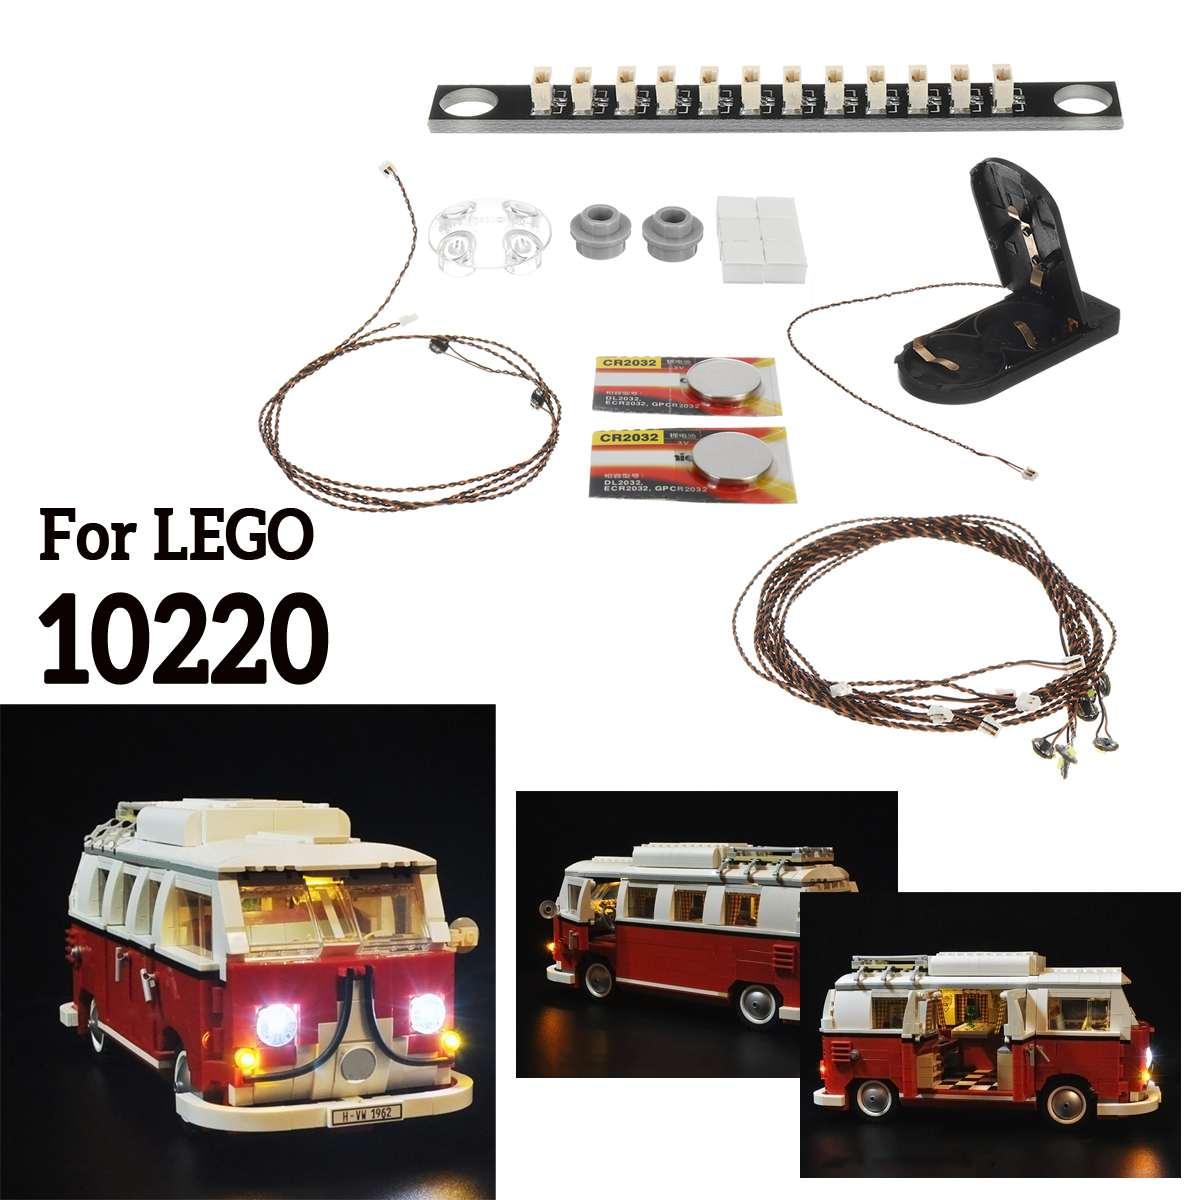 LEGO Creator 10220 Volkswagen T1 Camper Van Led Lighting Kit Top Quality Item